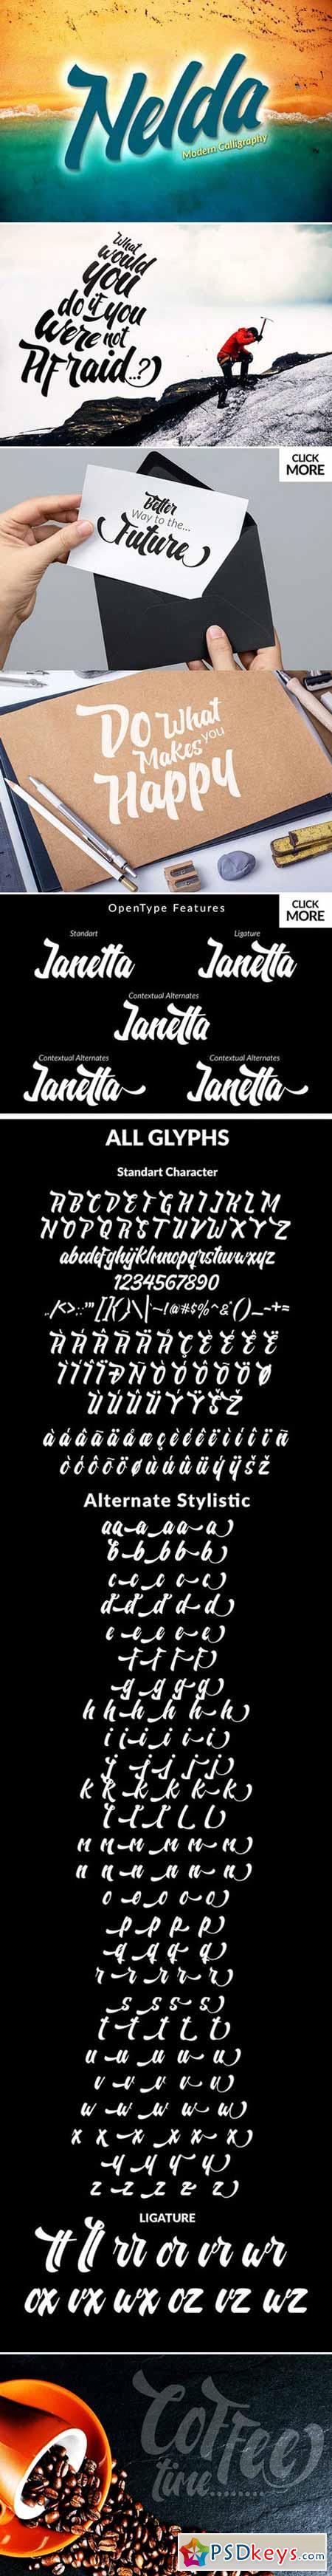 Nelda Typeface 395723